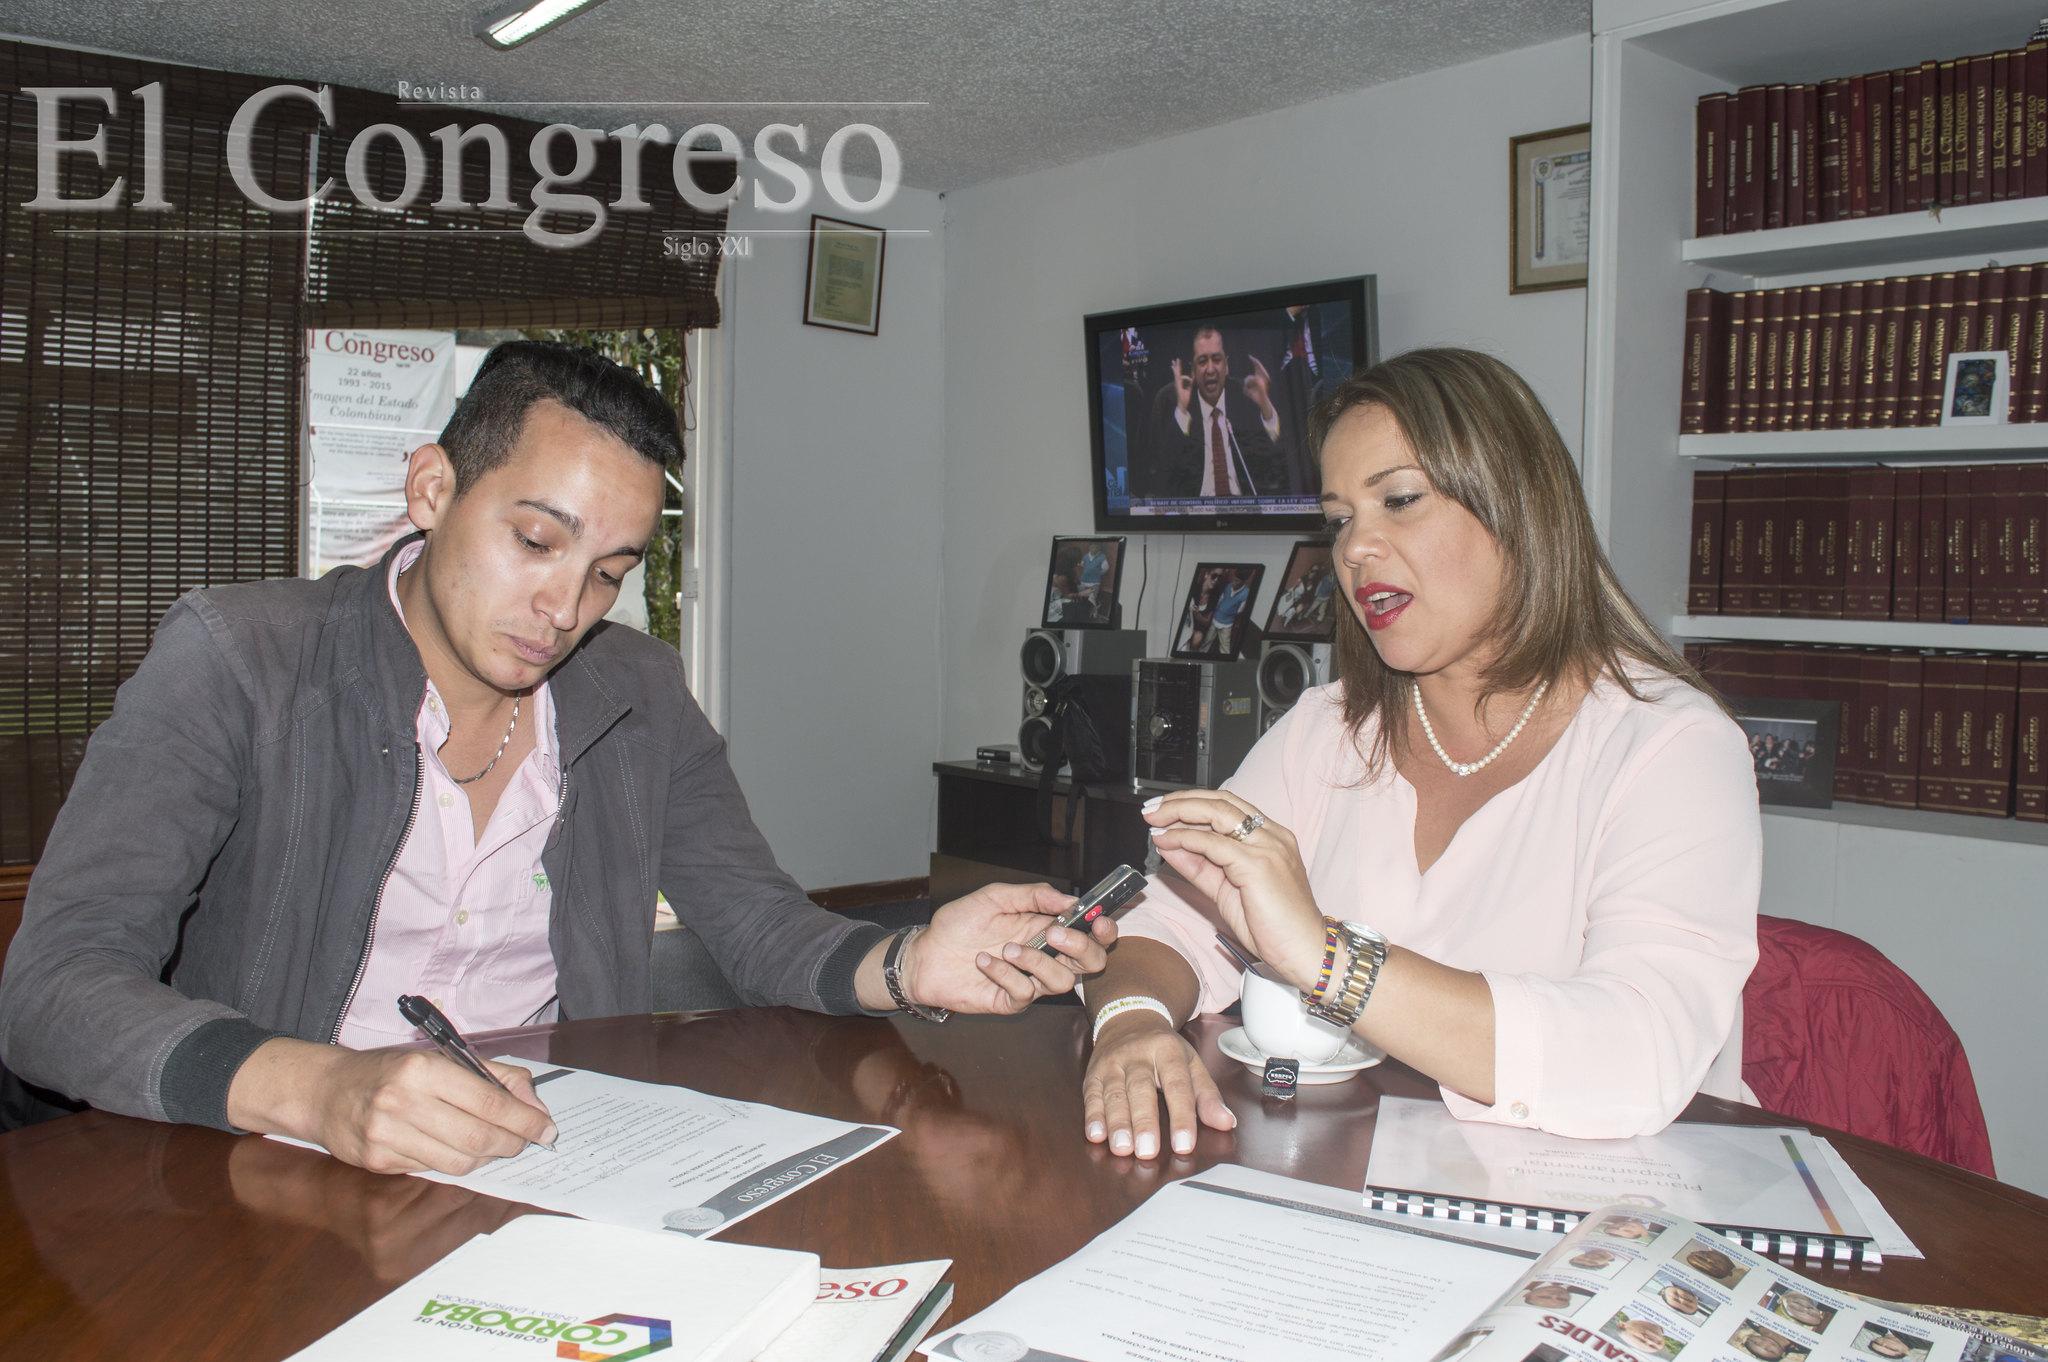 Secretaria de Cultura de Cordoba. Olga Elena Payares Urzola